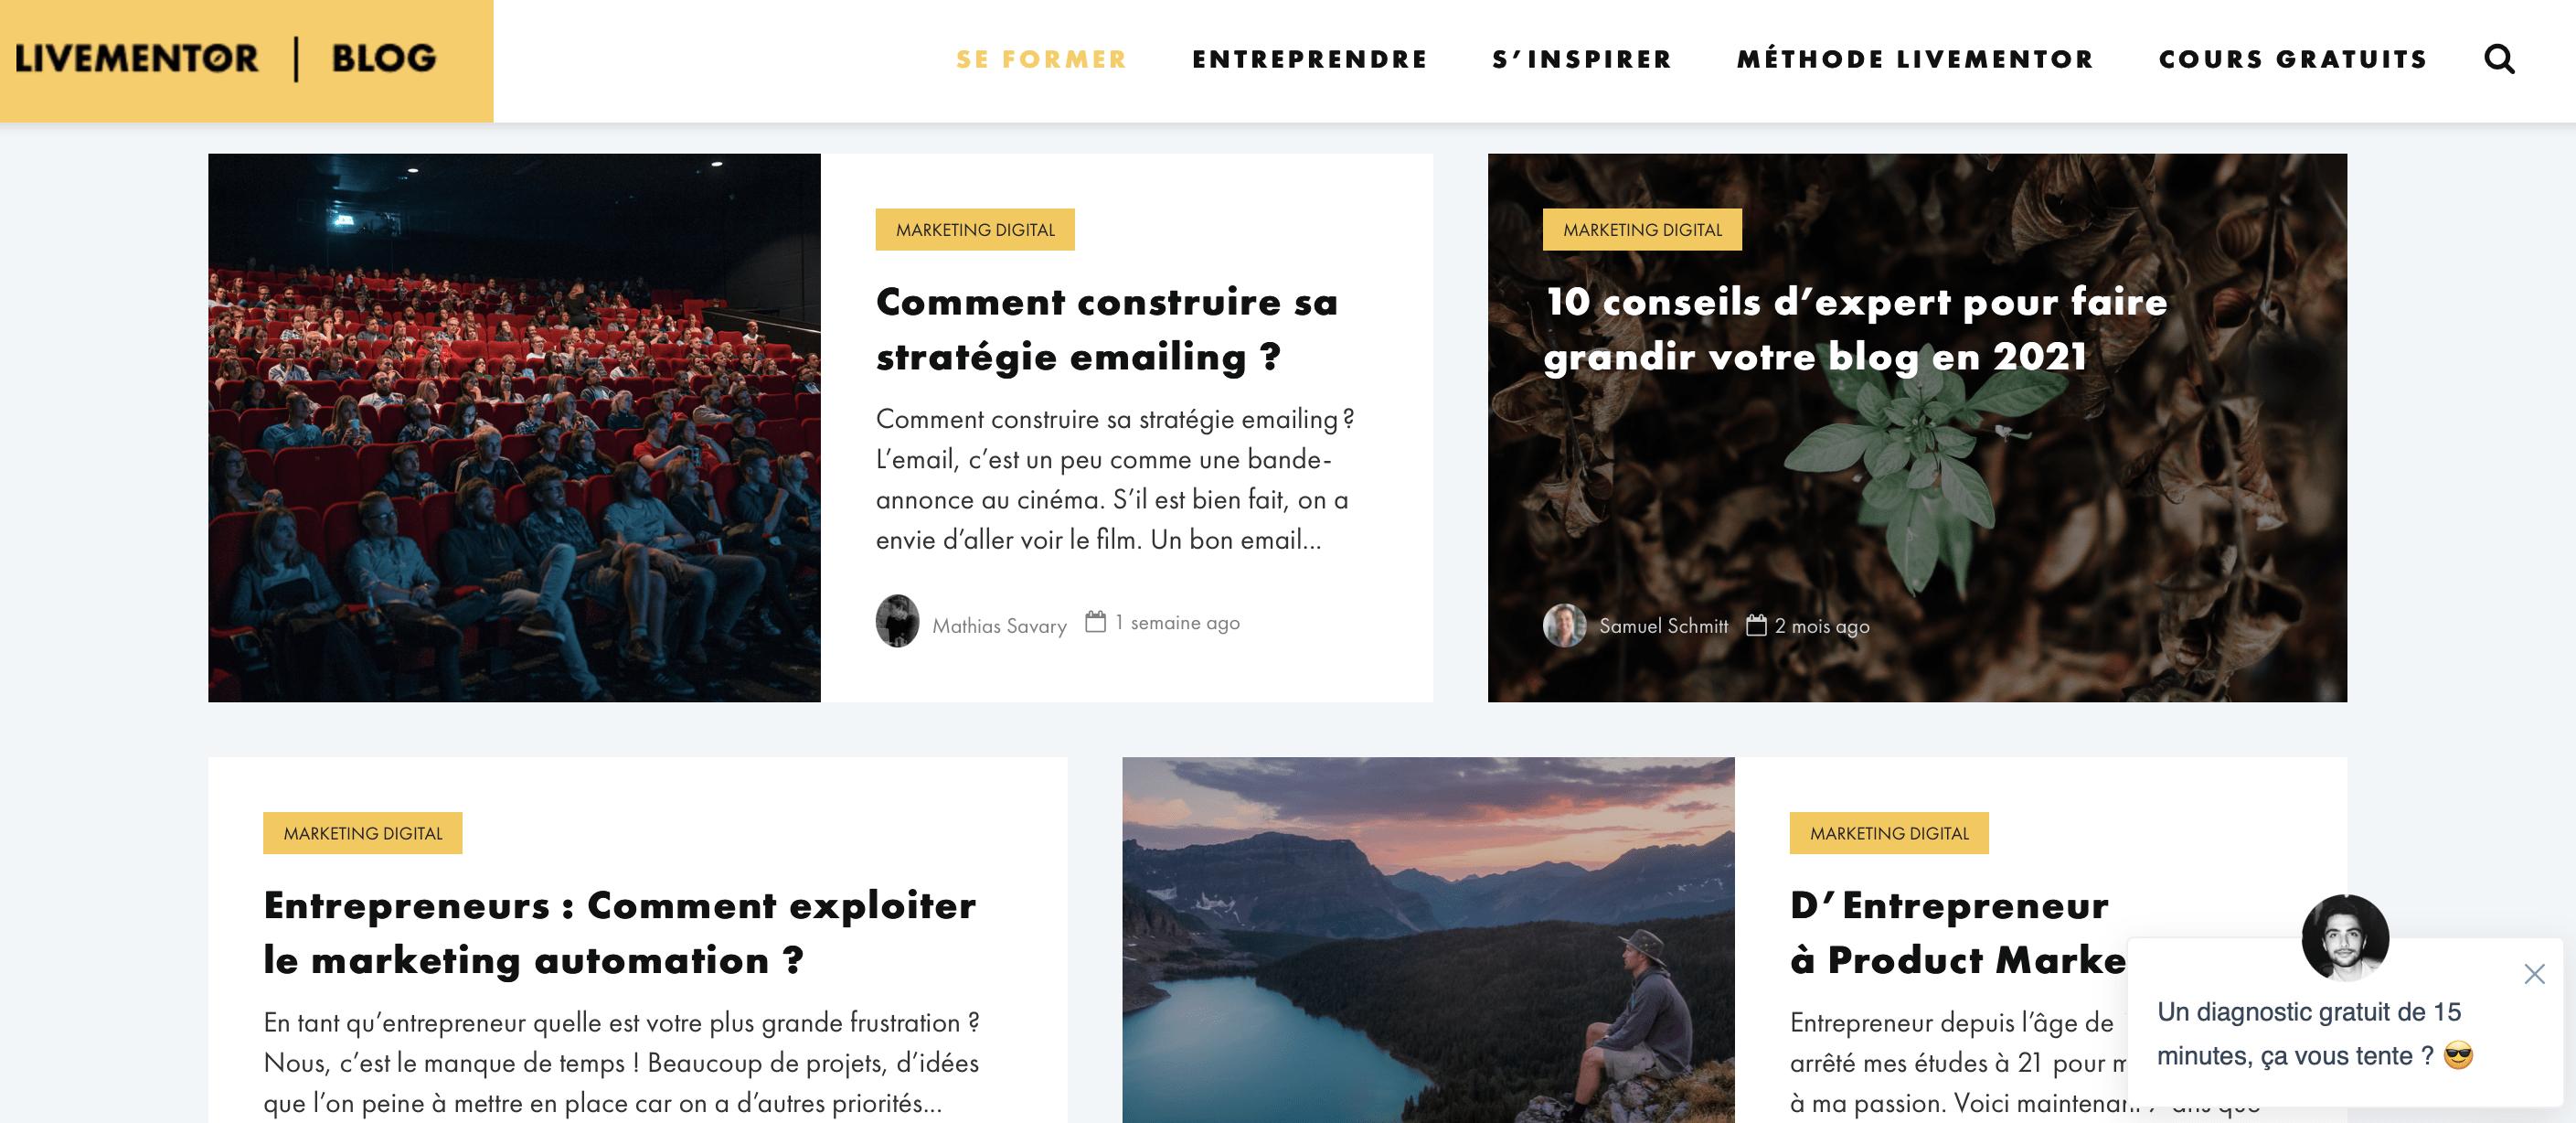 livementor blog social media et stratégie digitale